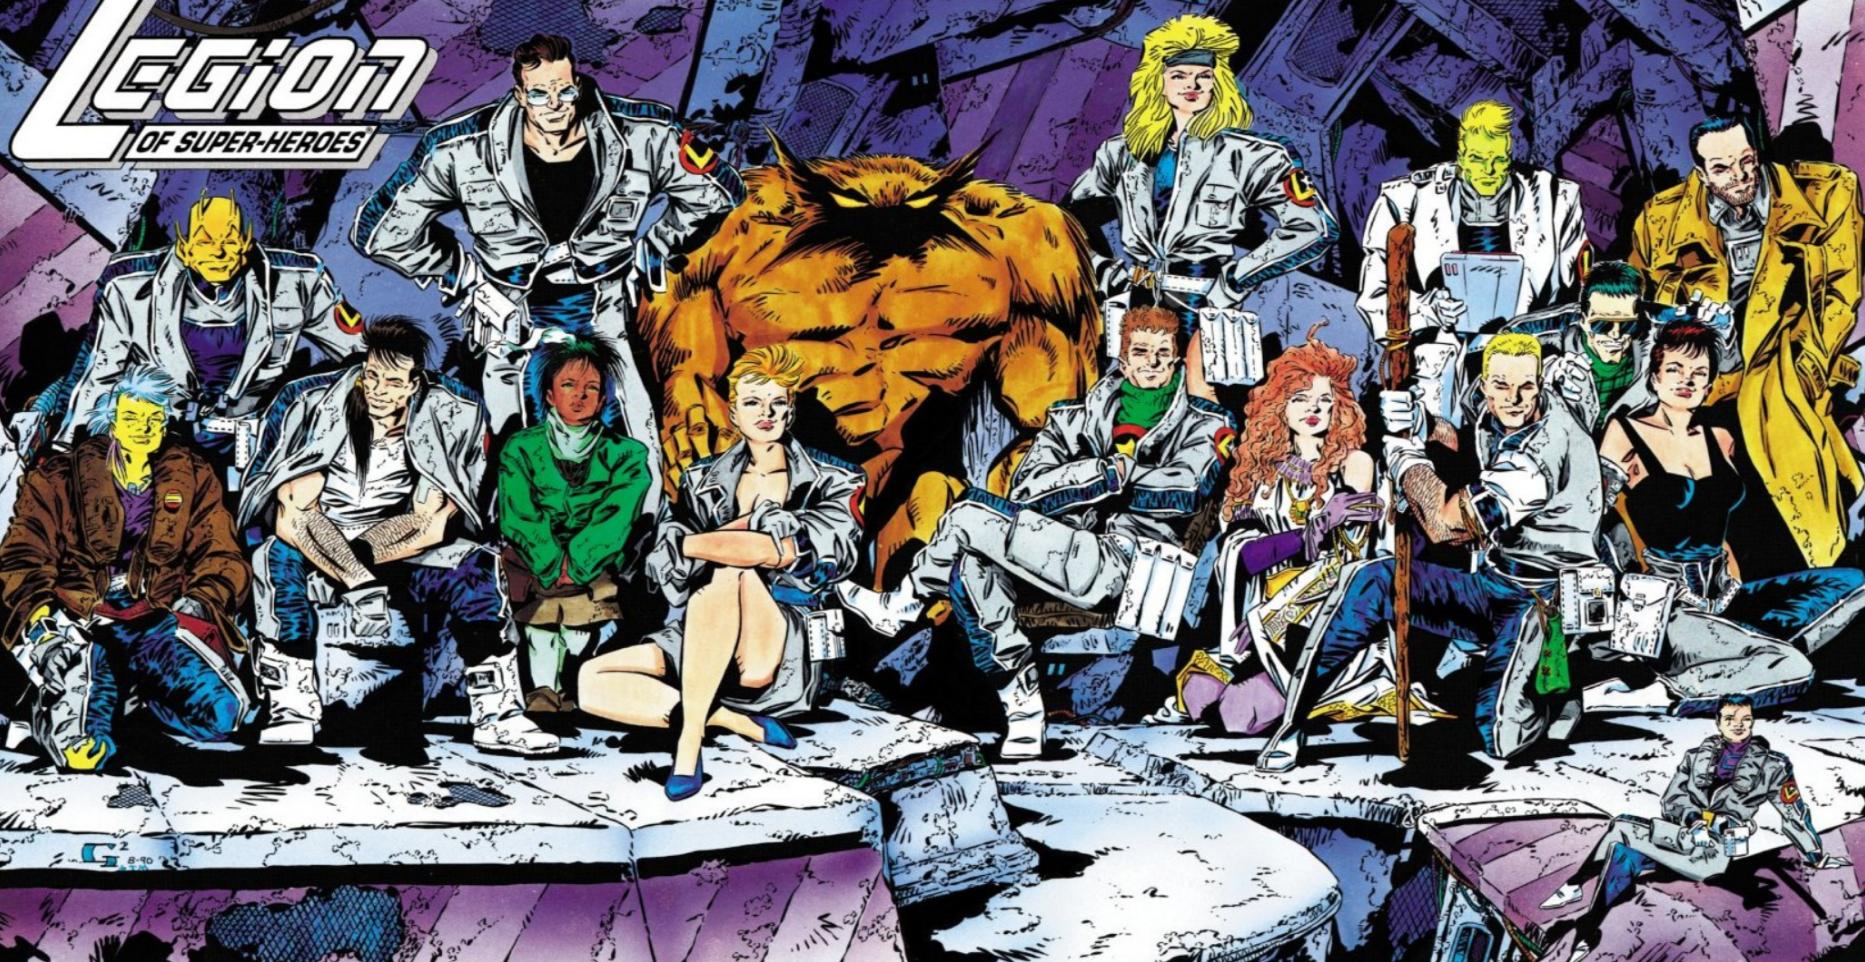 When The Legion Of Superheroes Got Freakin' Weird